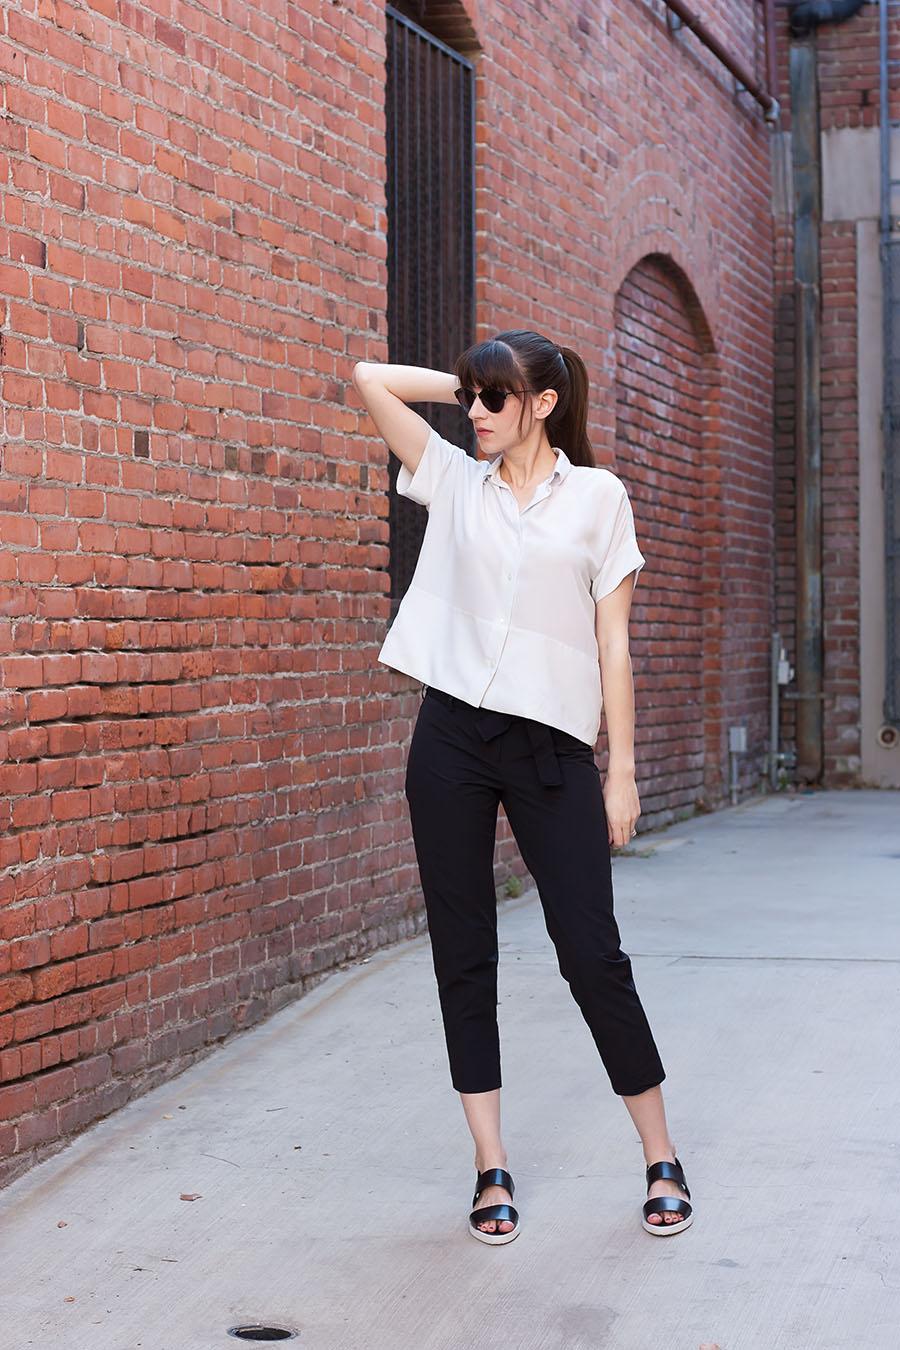 Everlane SIlk Shirt, COS Pants, Everlane Street Sandal, Minimalist Style